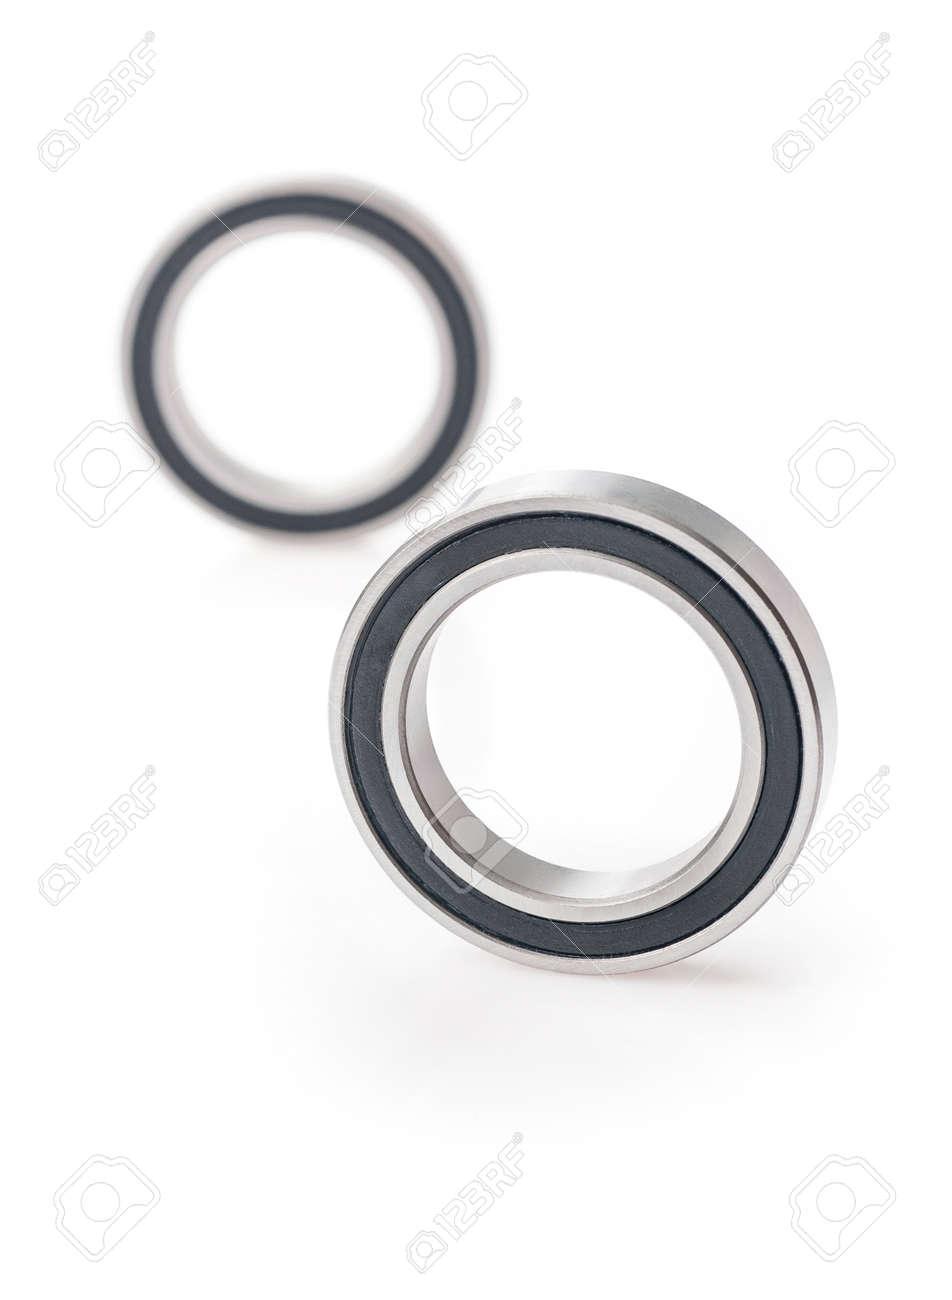 ball bearings isolated - 125452446